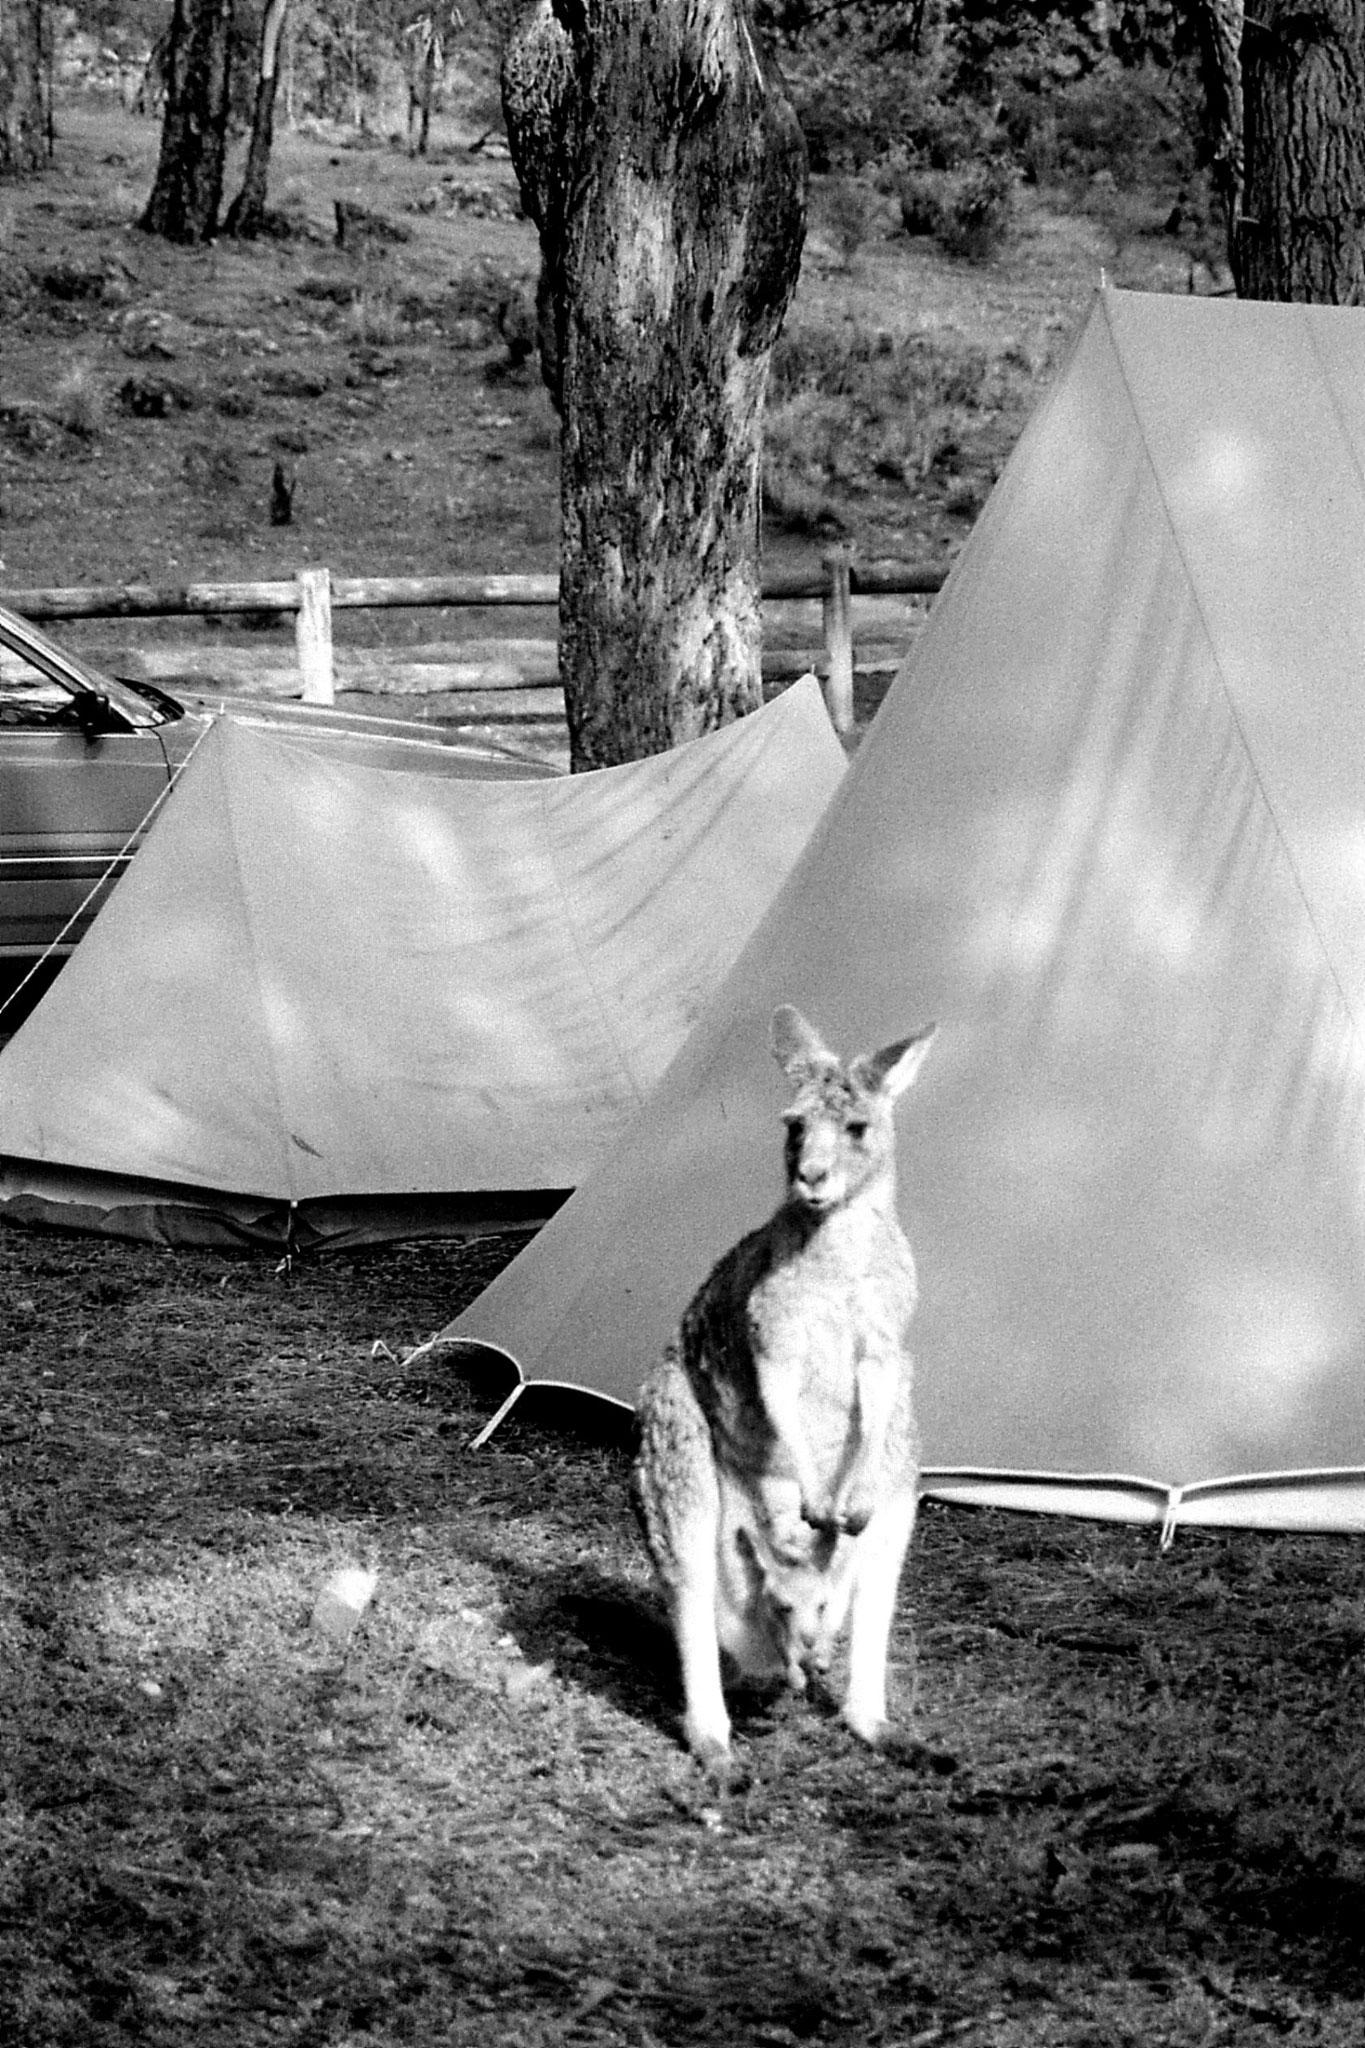 21/9/1990: 27: Grampians Zumsteins campsite